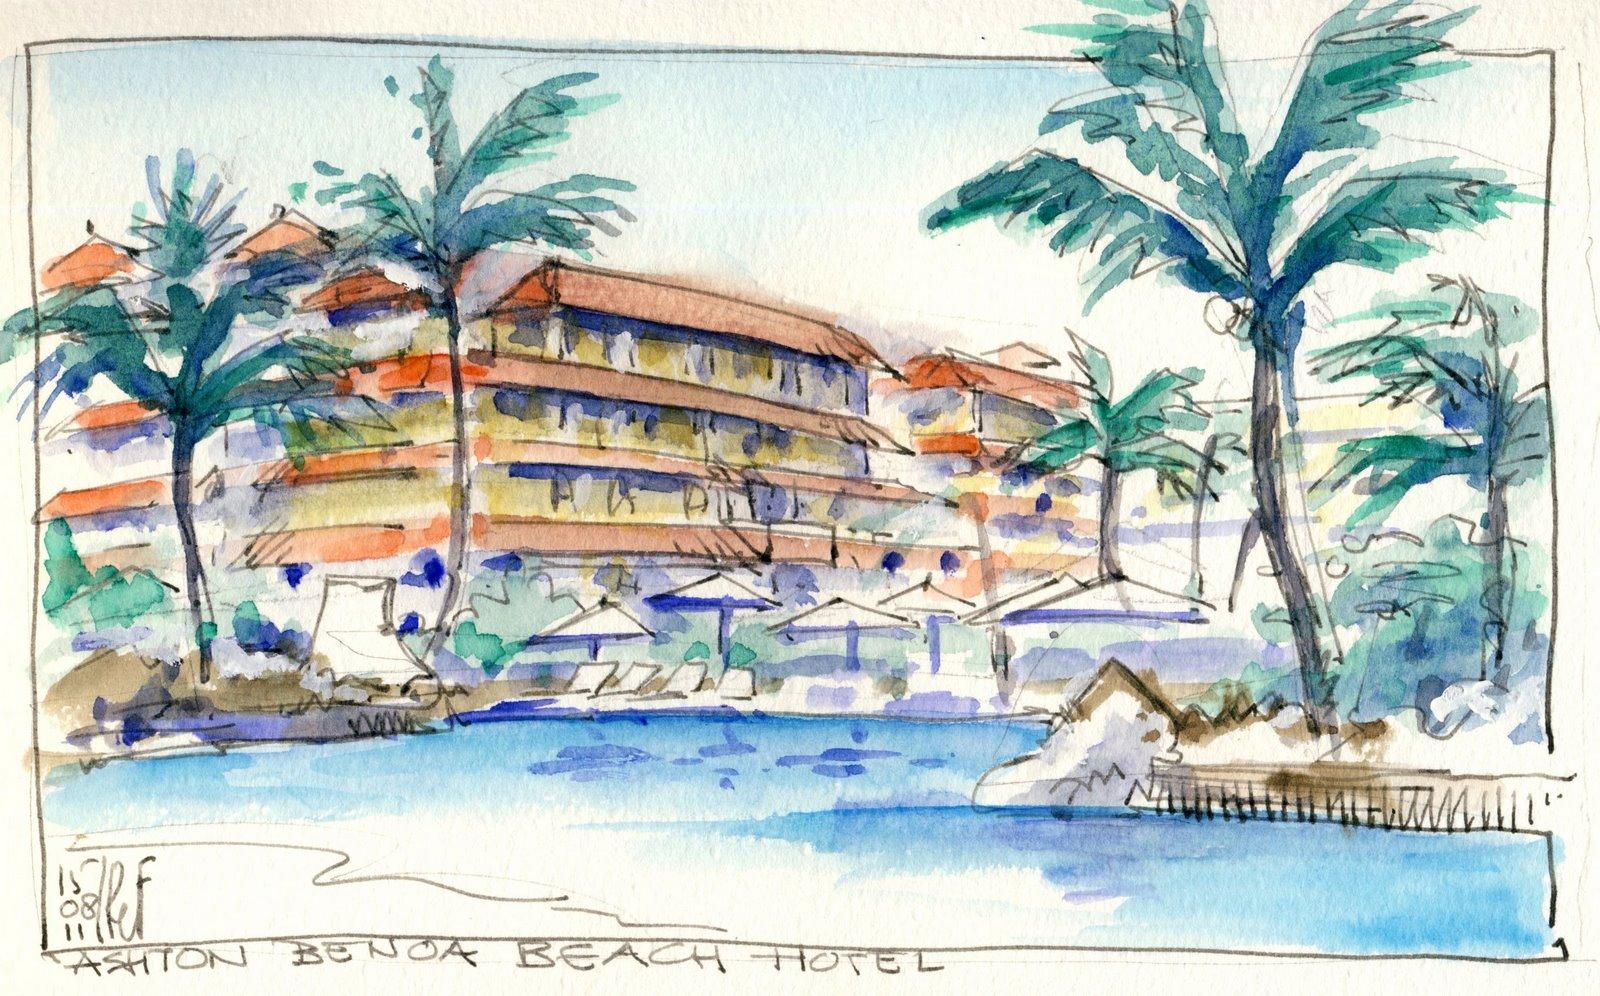 Rene fijten sketches september 2011 for Swimming pool sketch